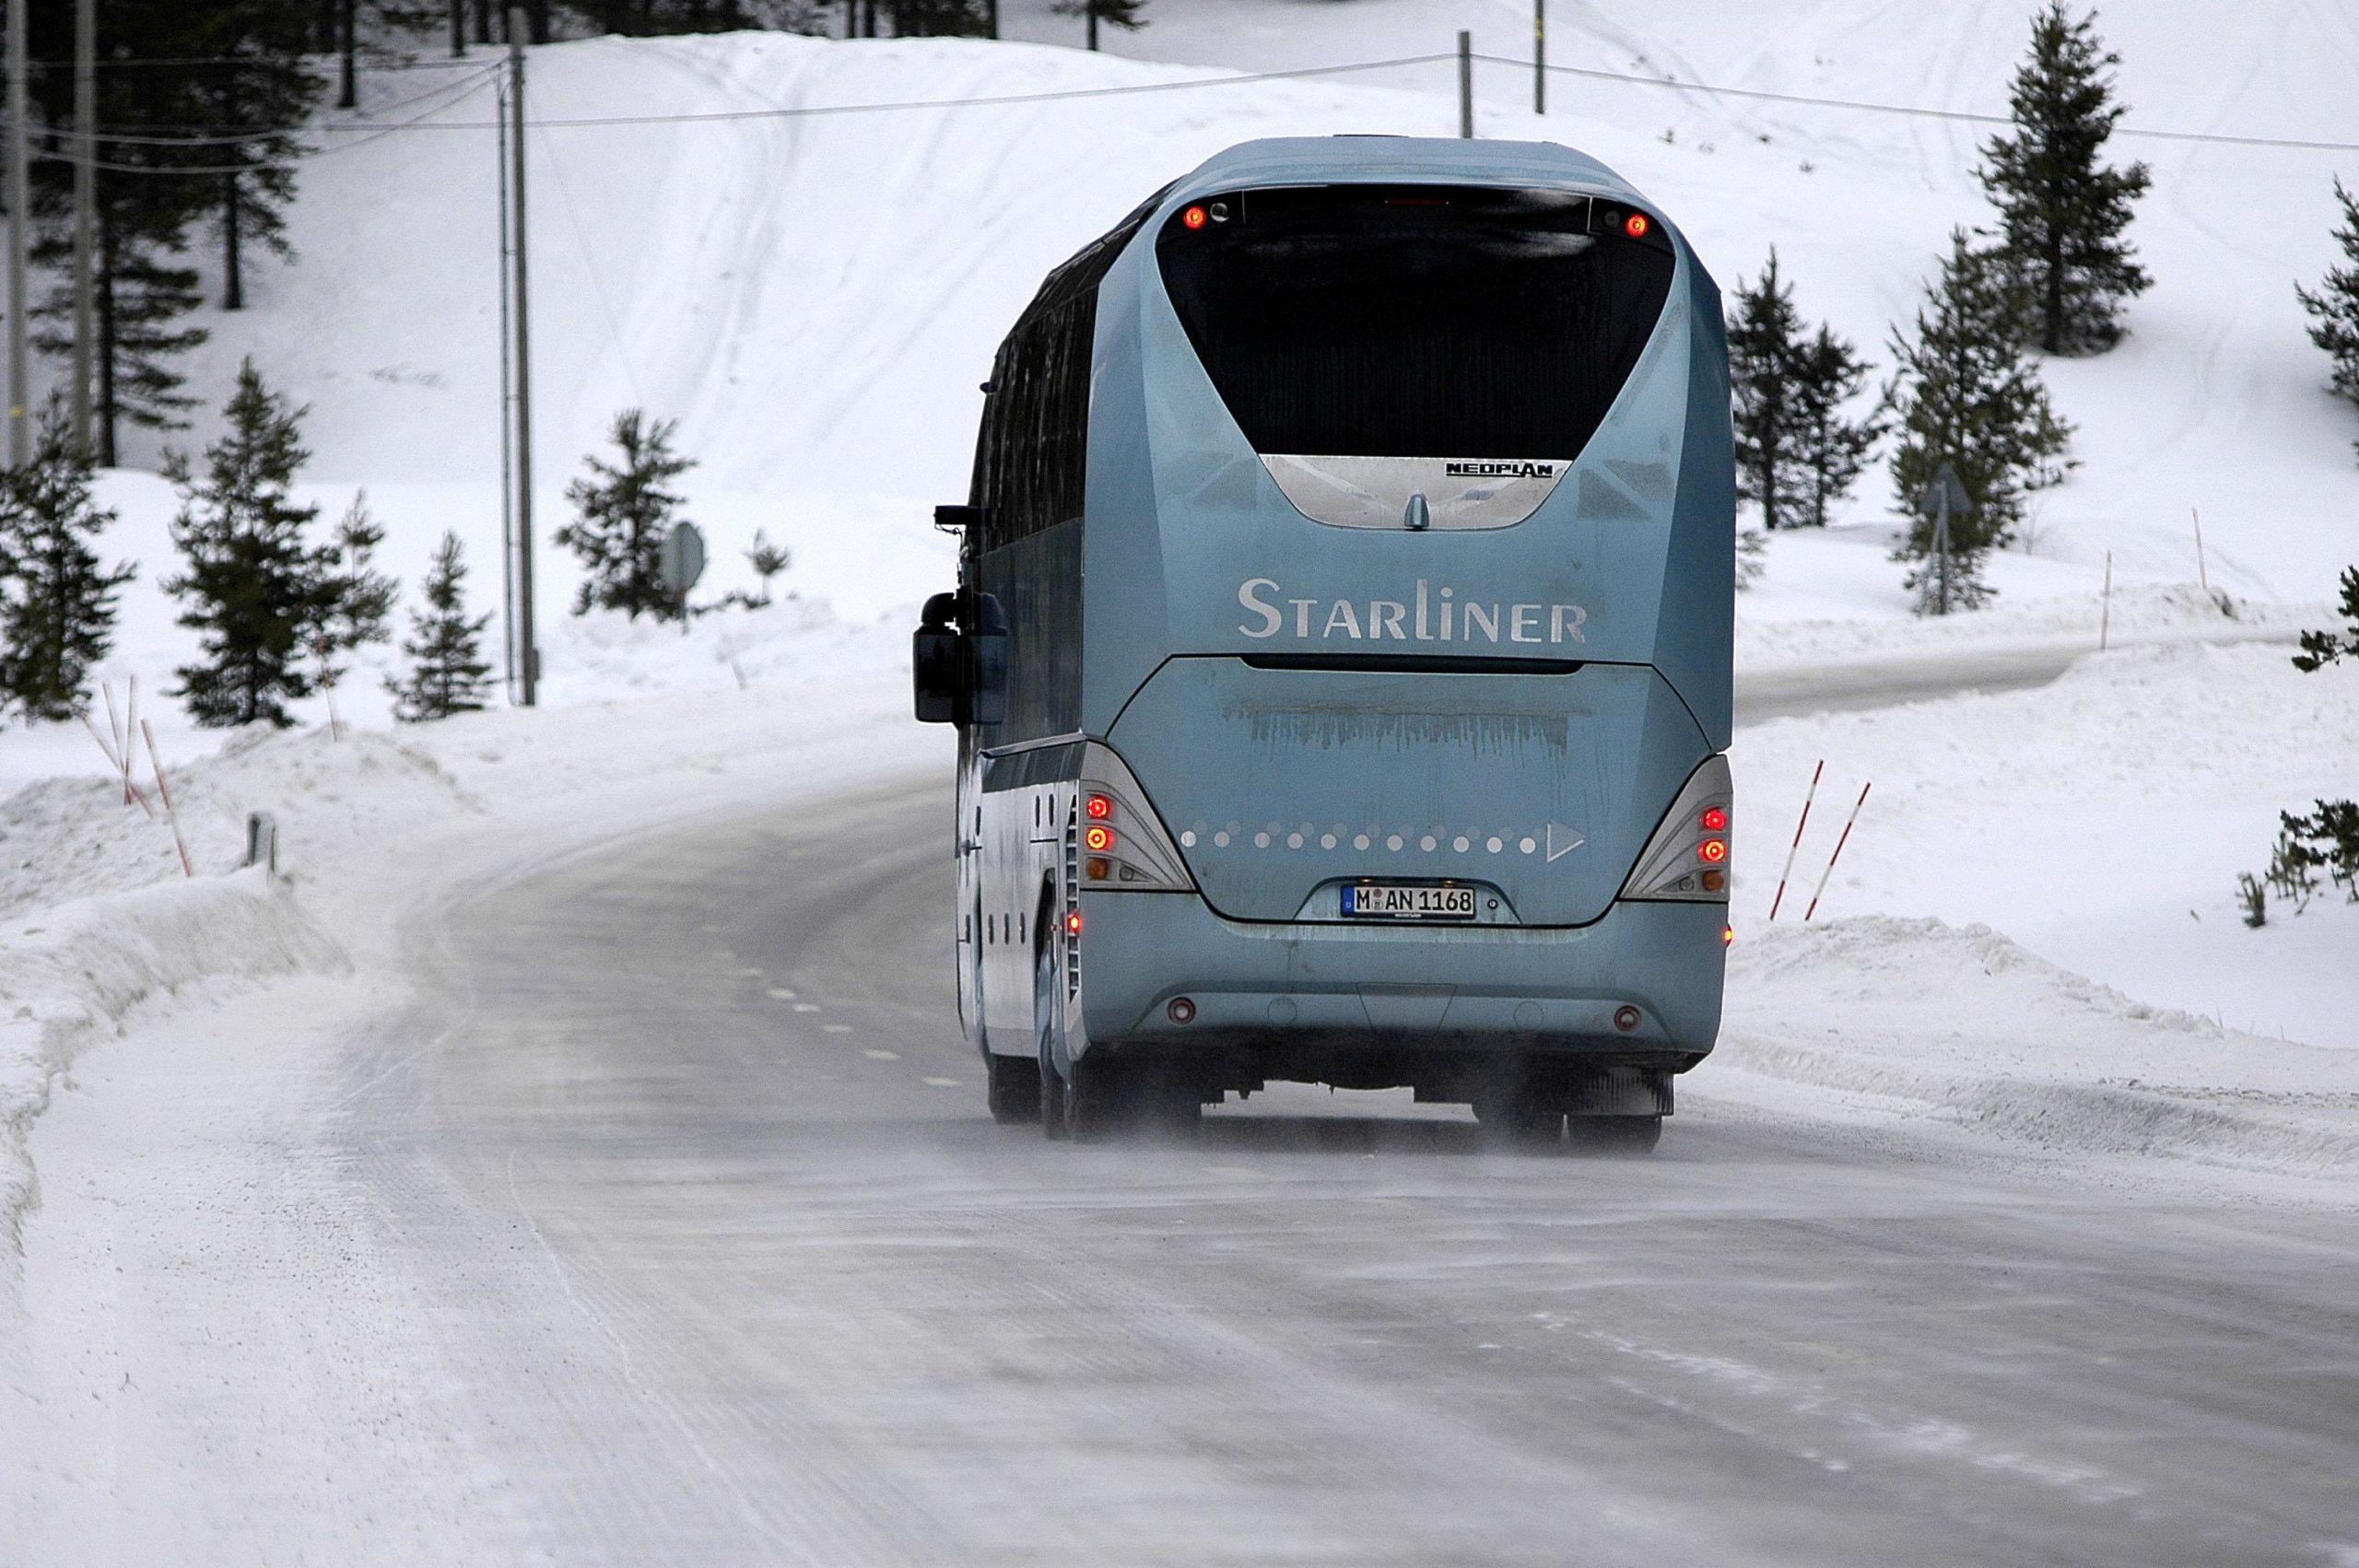 location autocar pour aller au ski cars de france. Black Bedroom Furniture Sets. Home Design Ideas